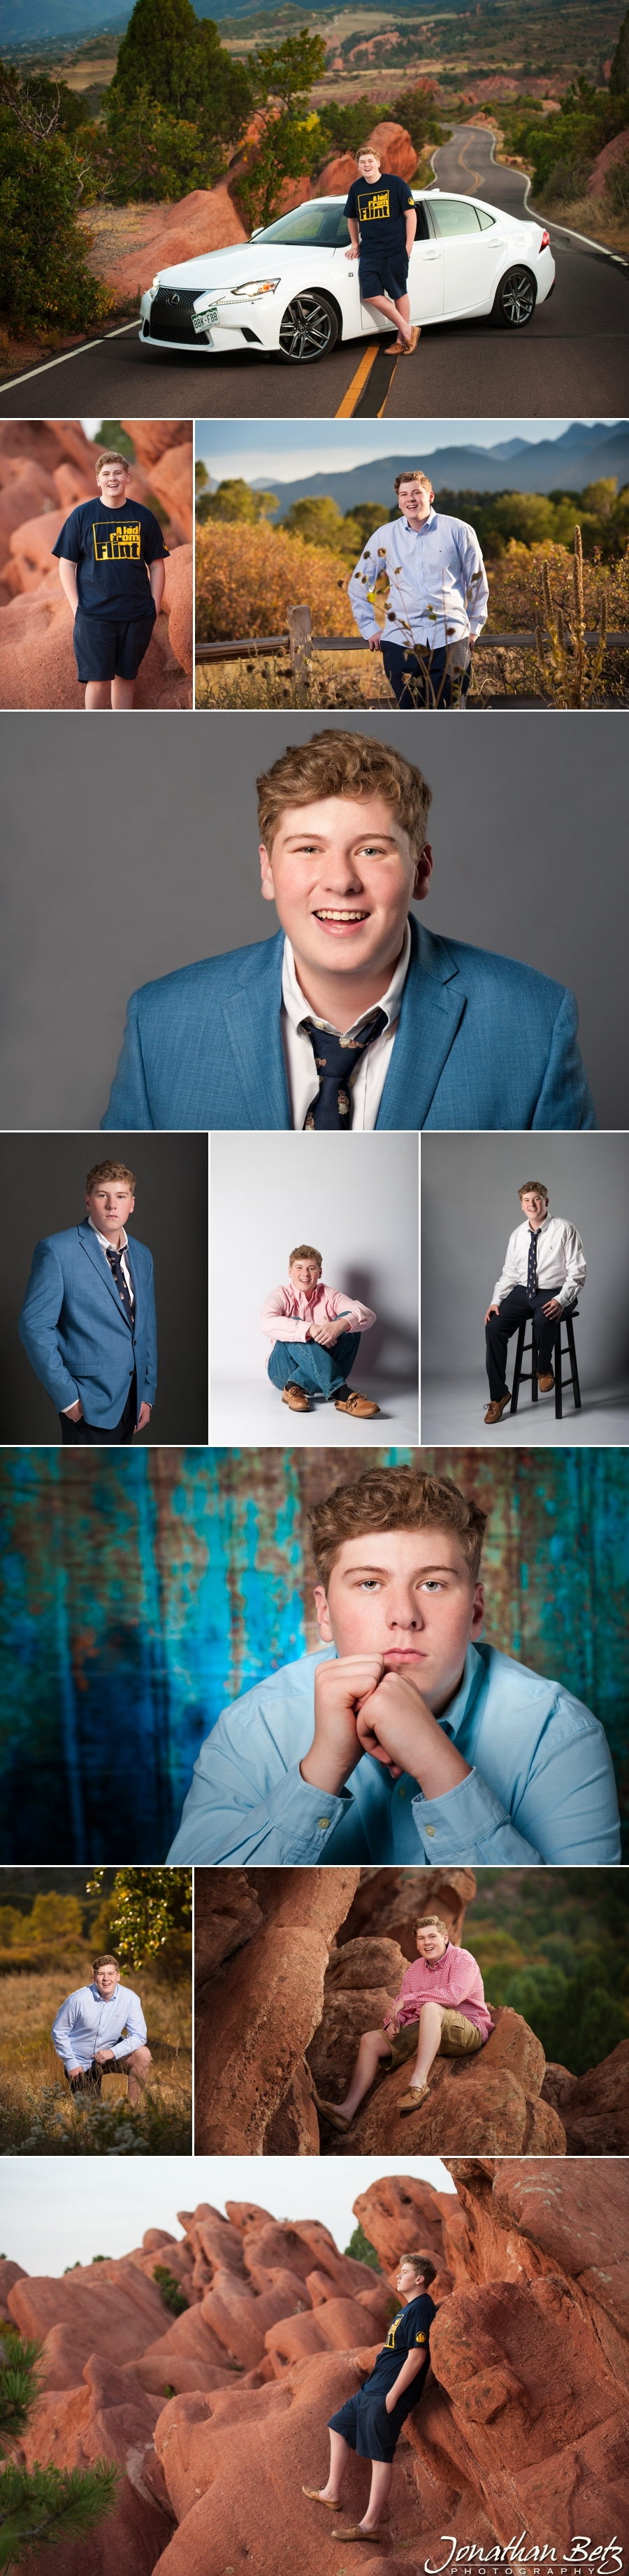 senior pictures Pine Creek High School Senior guy studio and outdoor portraits Colorado Springs Photographer